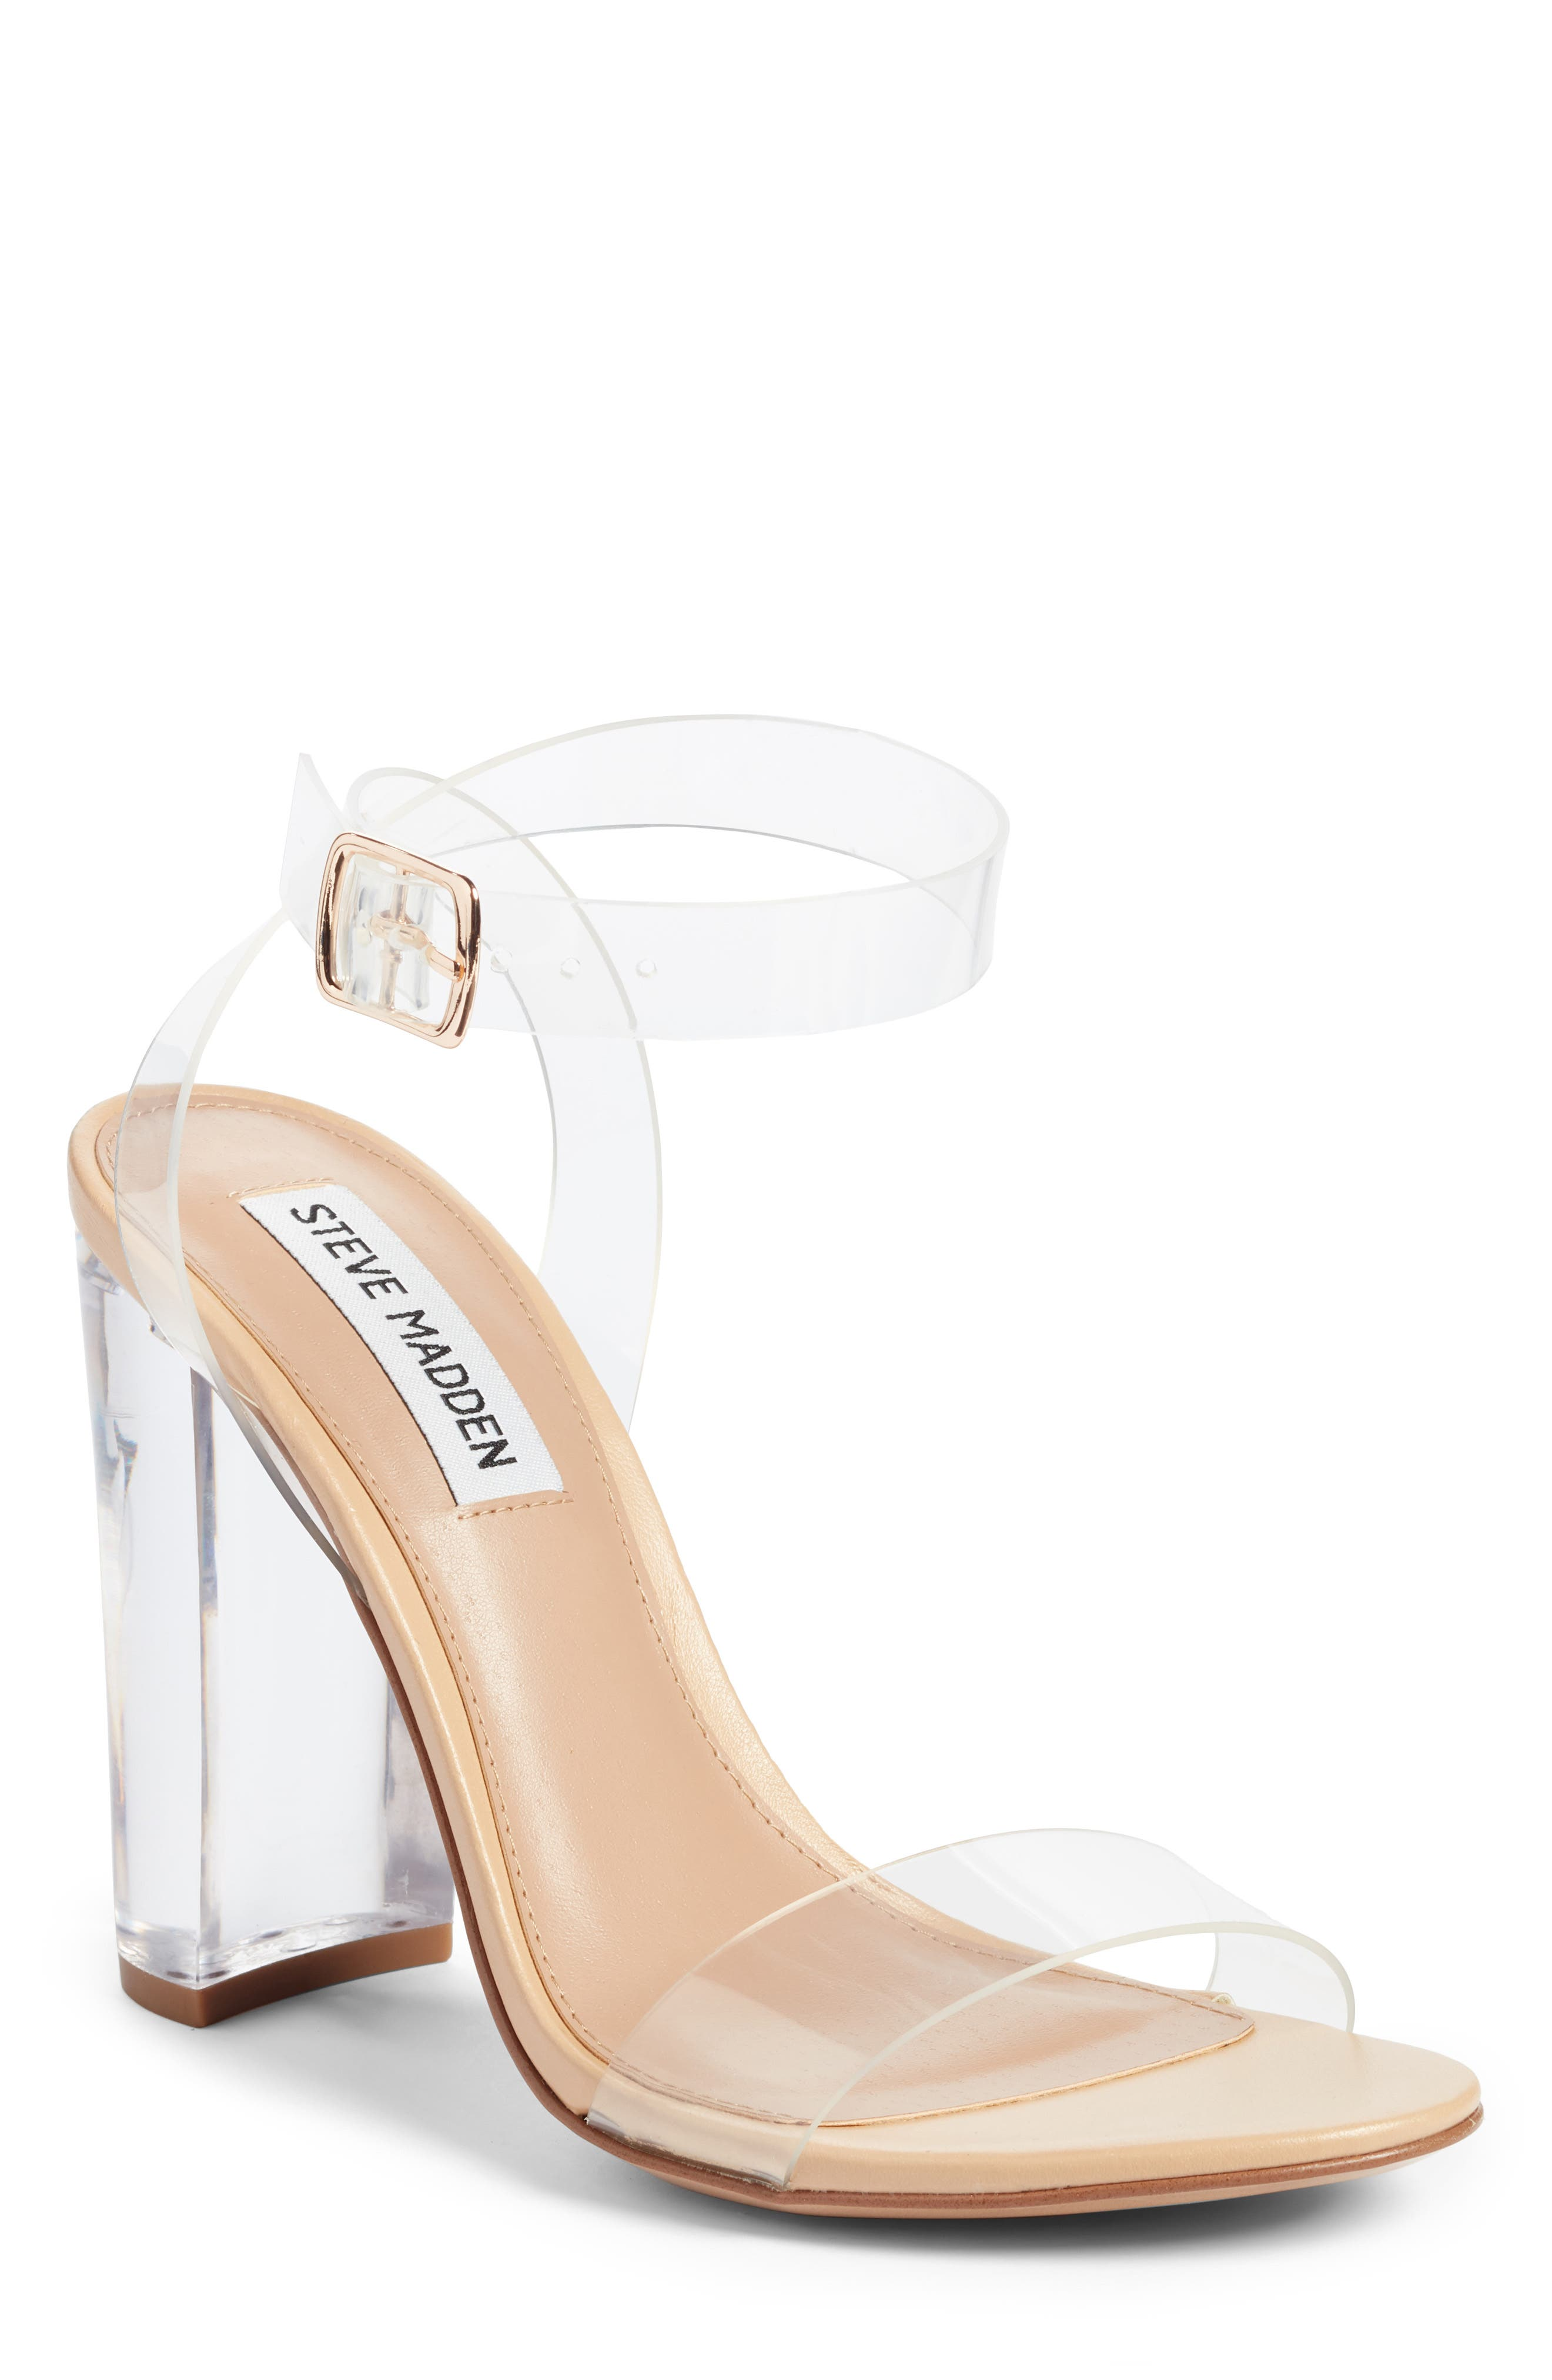 STEVE MADDEN Camille Clear Sandal, Main, color, CLEAR